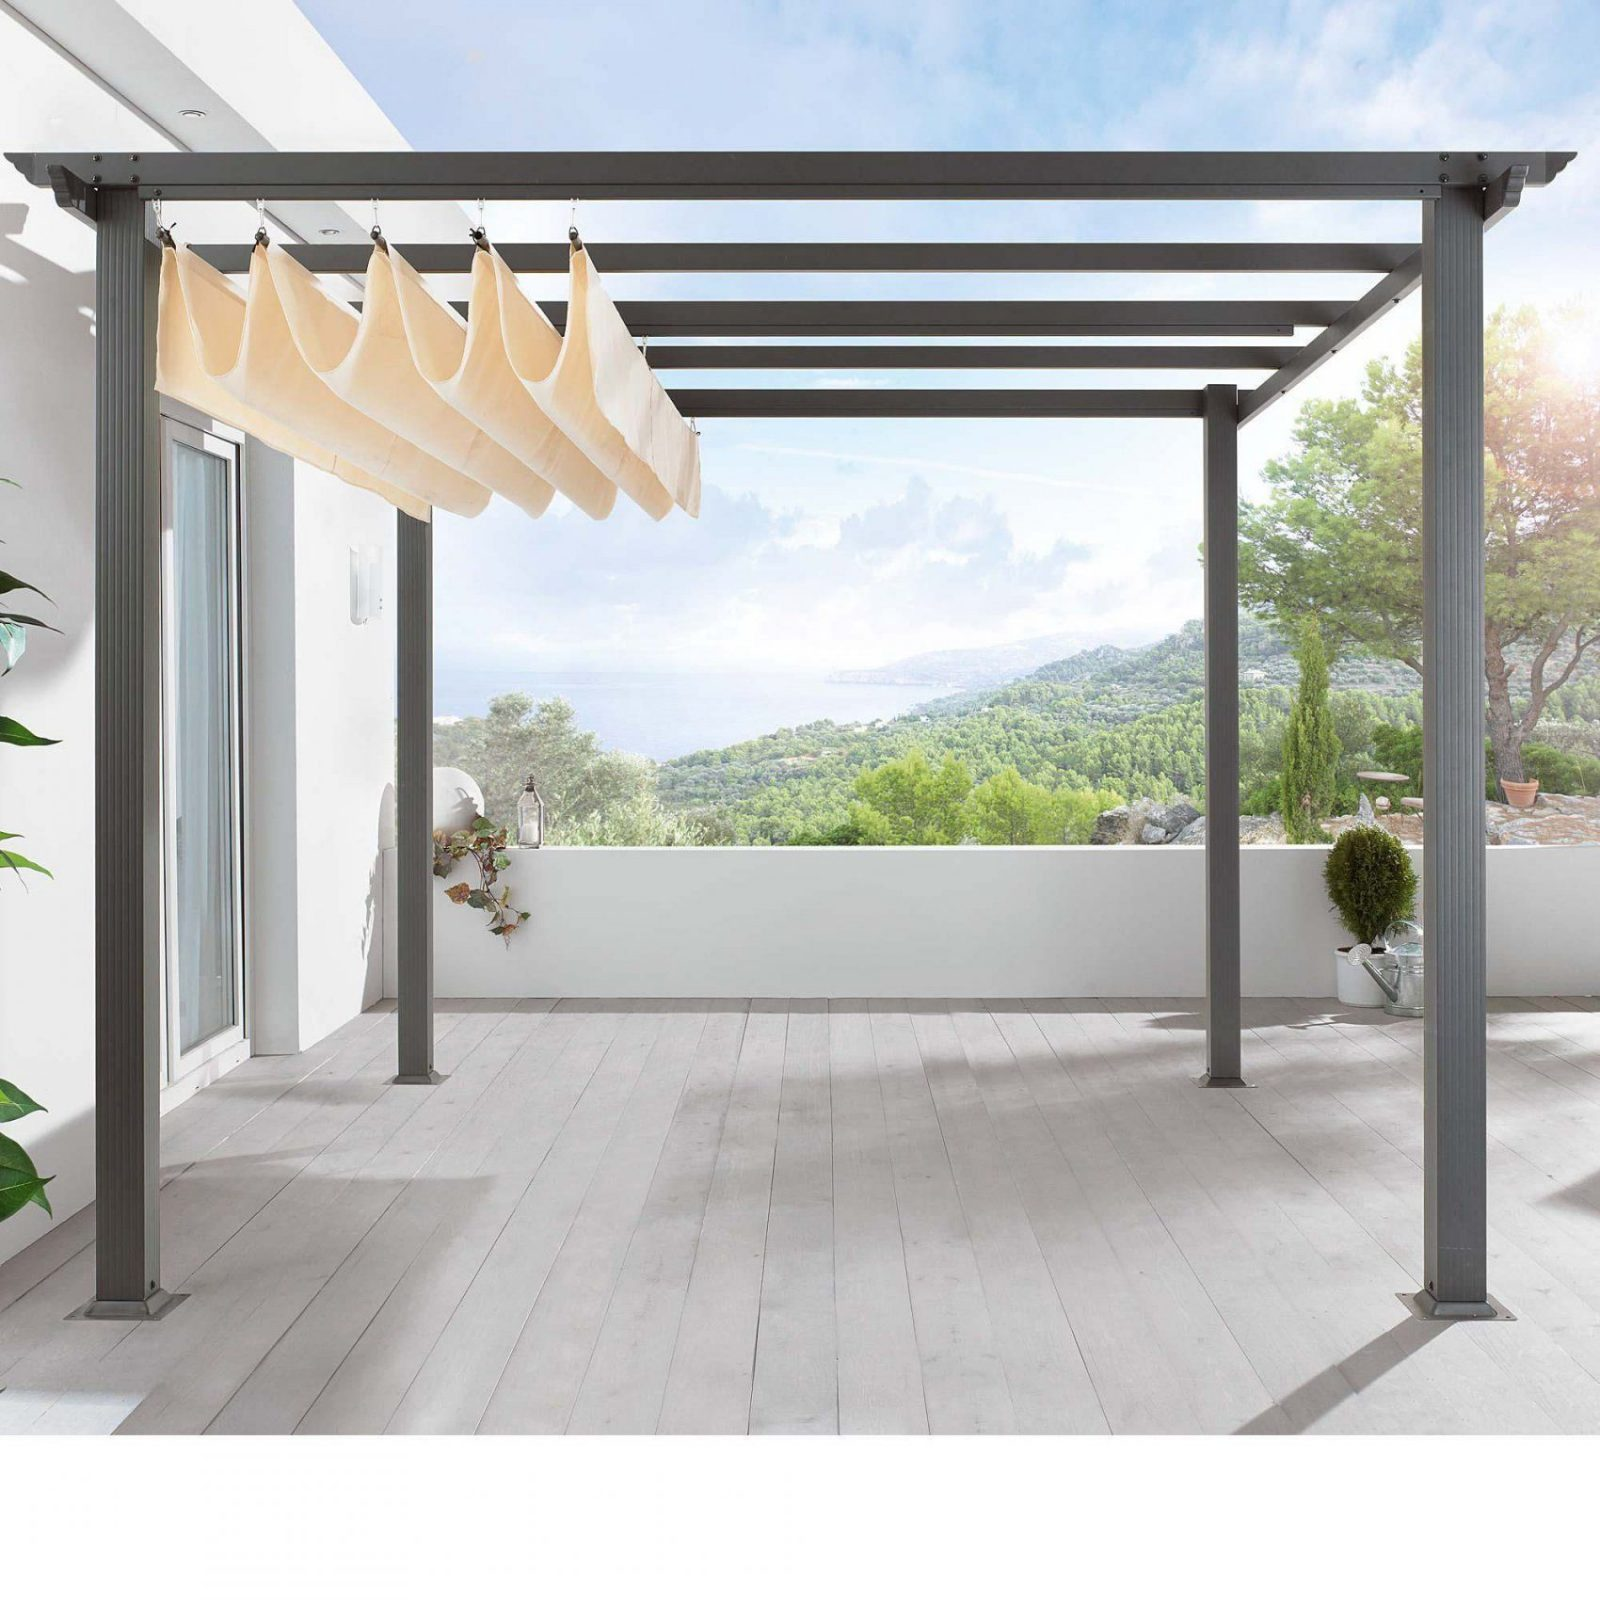 Pavillon Mit Faltdach Hh97 – Hitoiro von Flachdachpergola 3 X 4 Bild